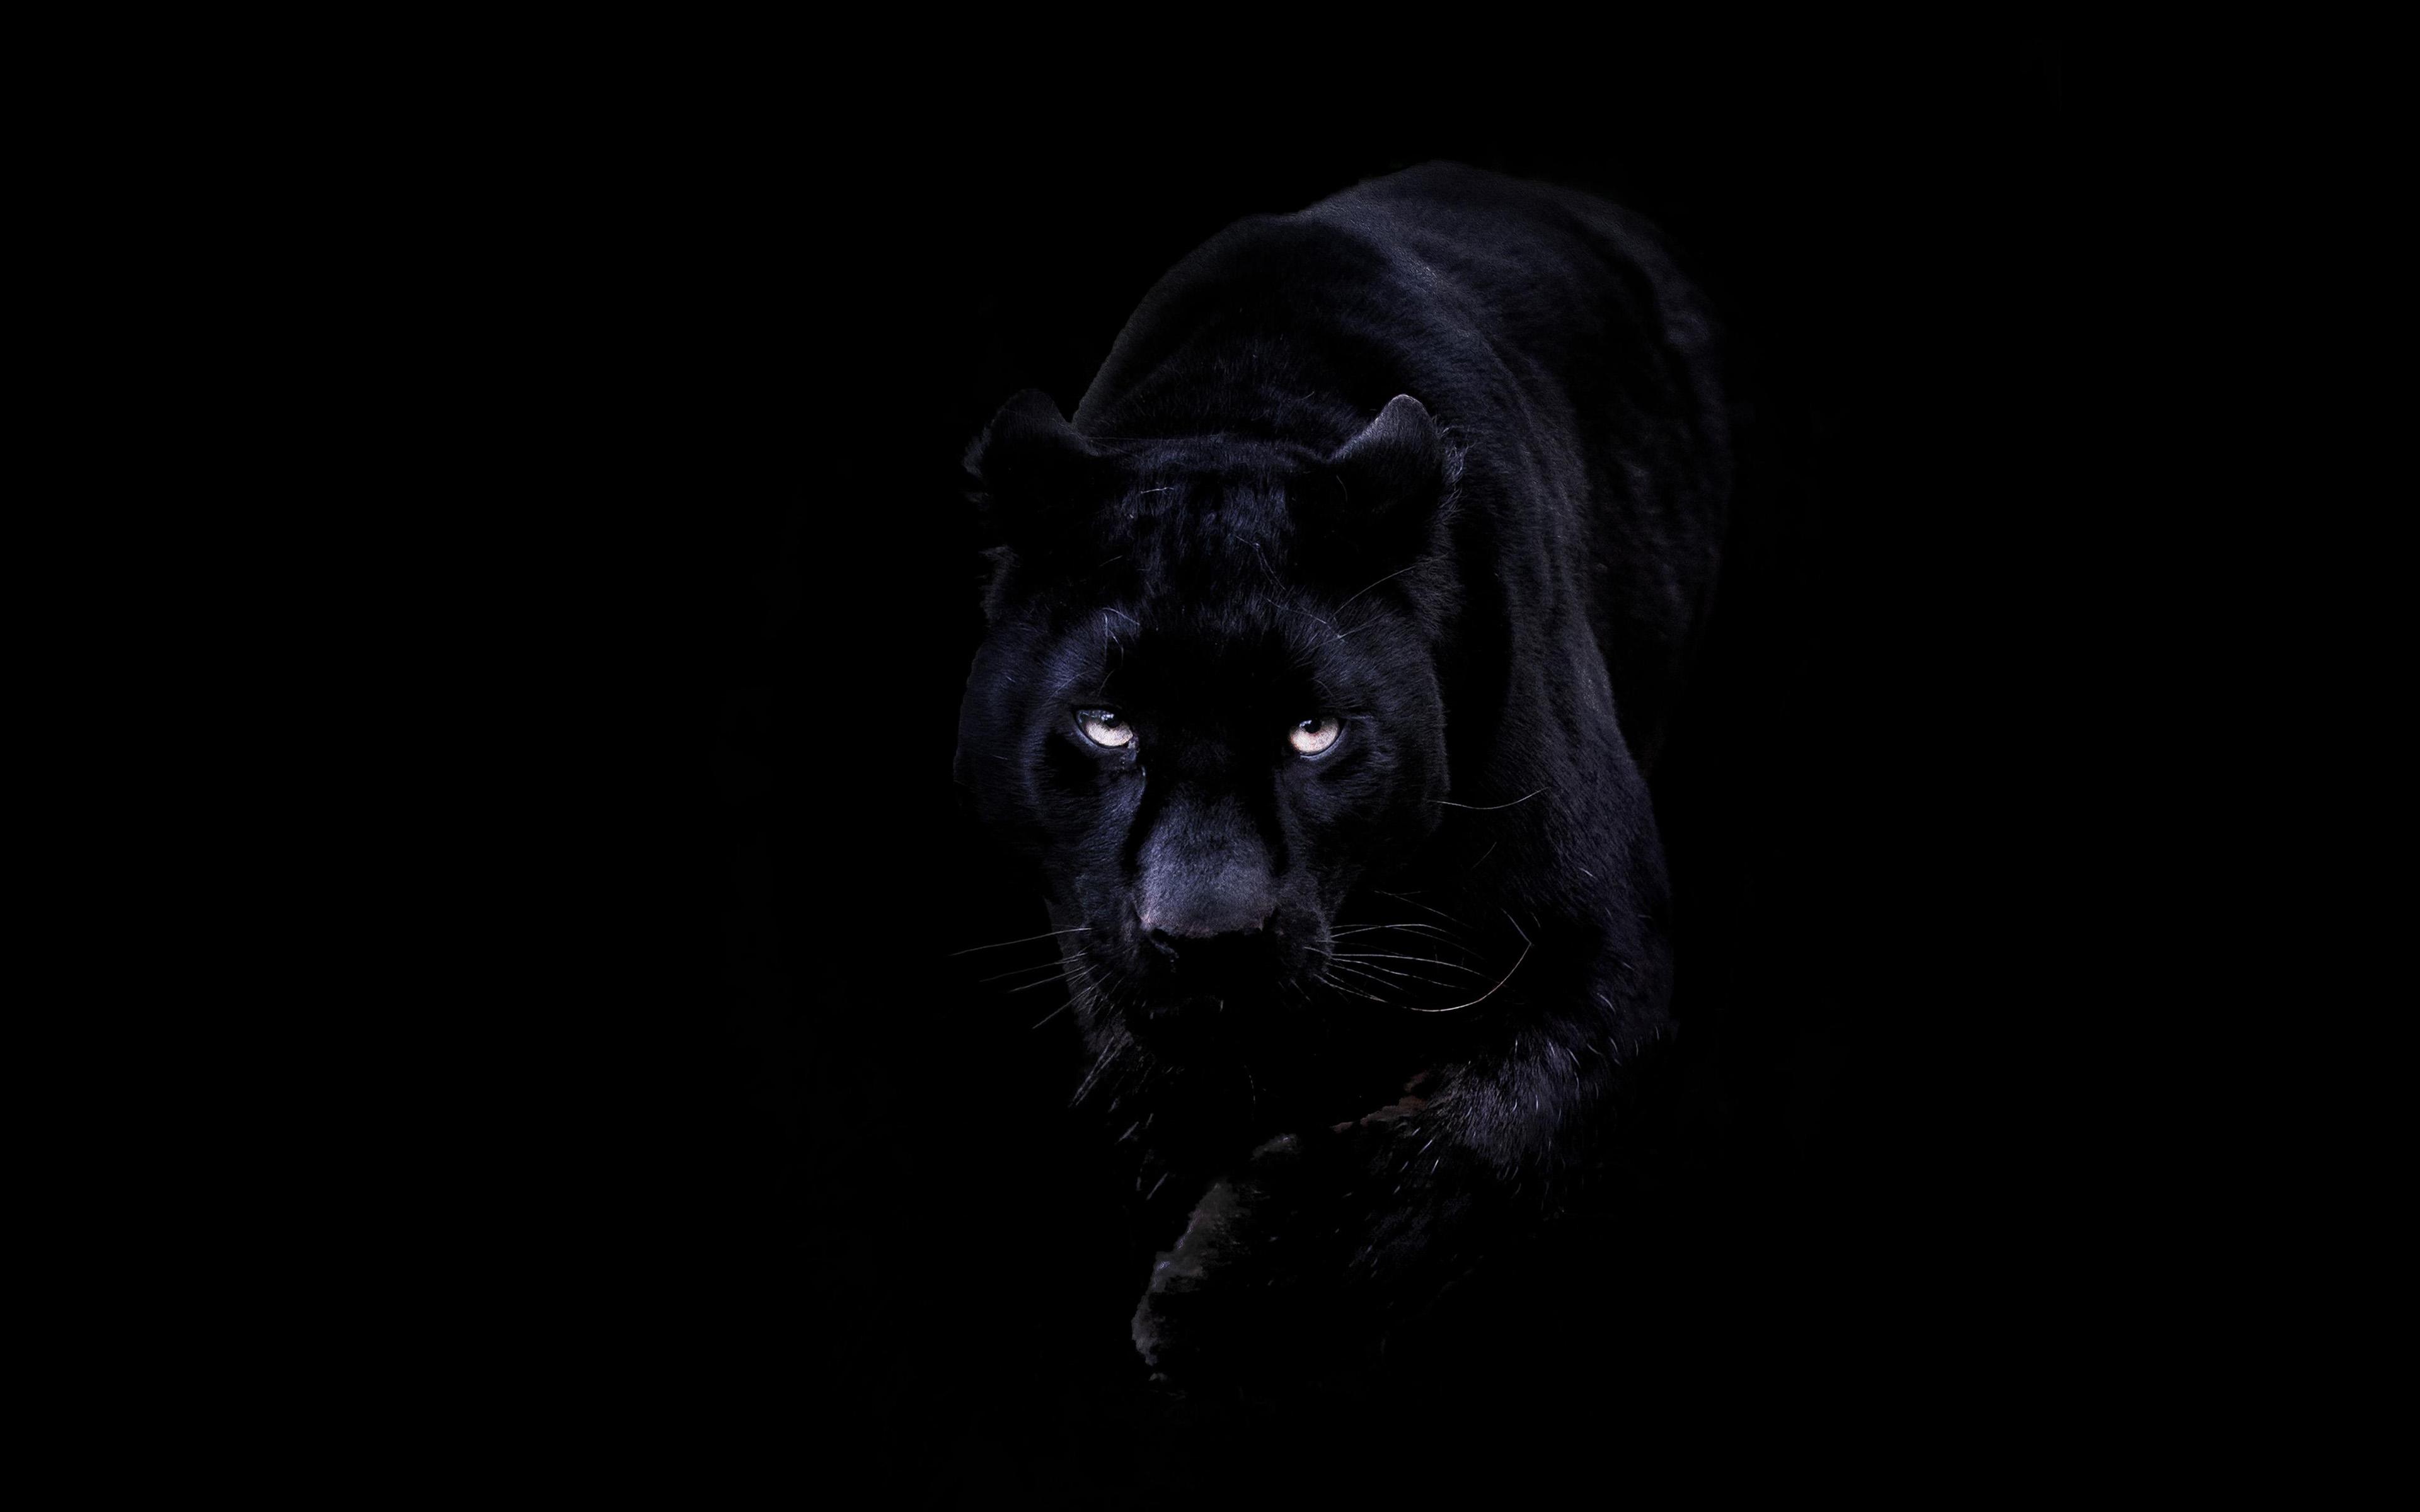 Bd93 animal dark black pahter art illustration wallpaper - Animal black background wallpaper ...